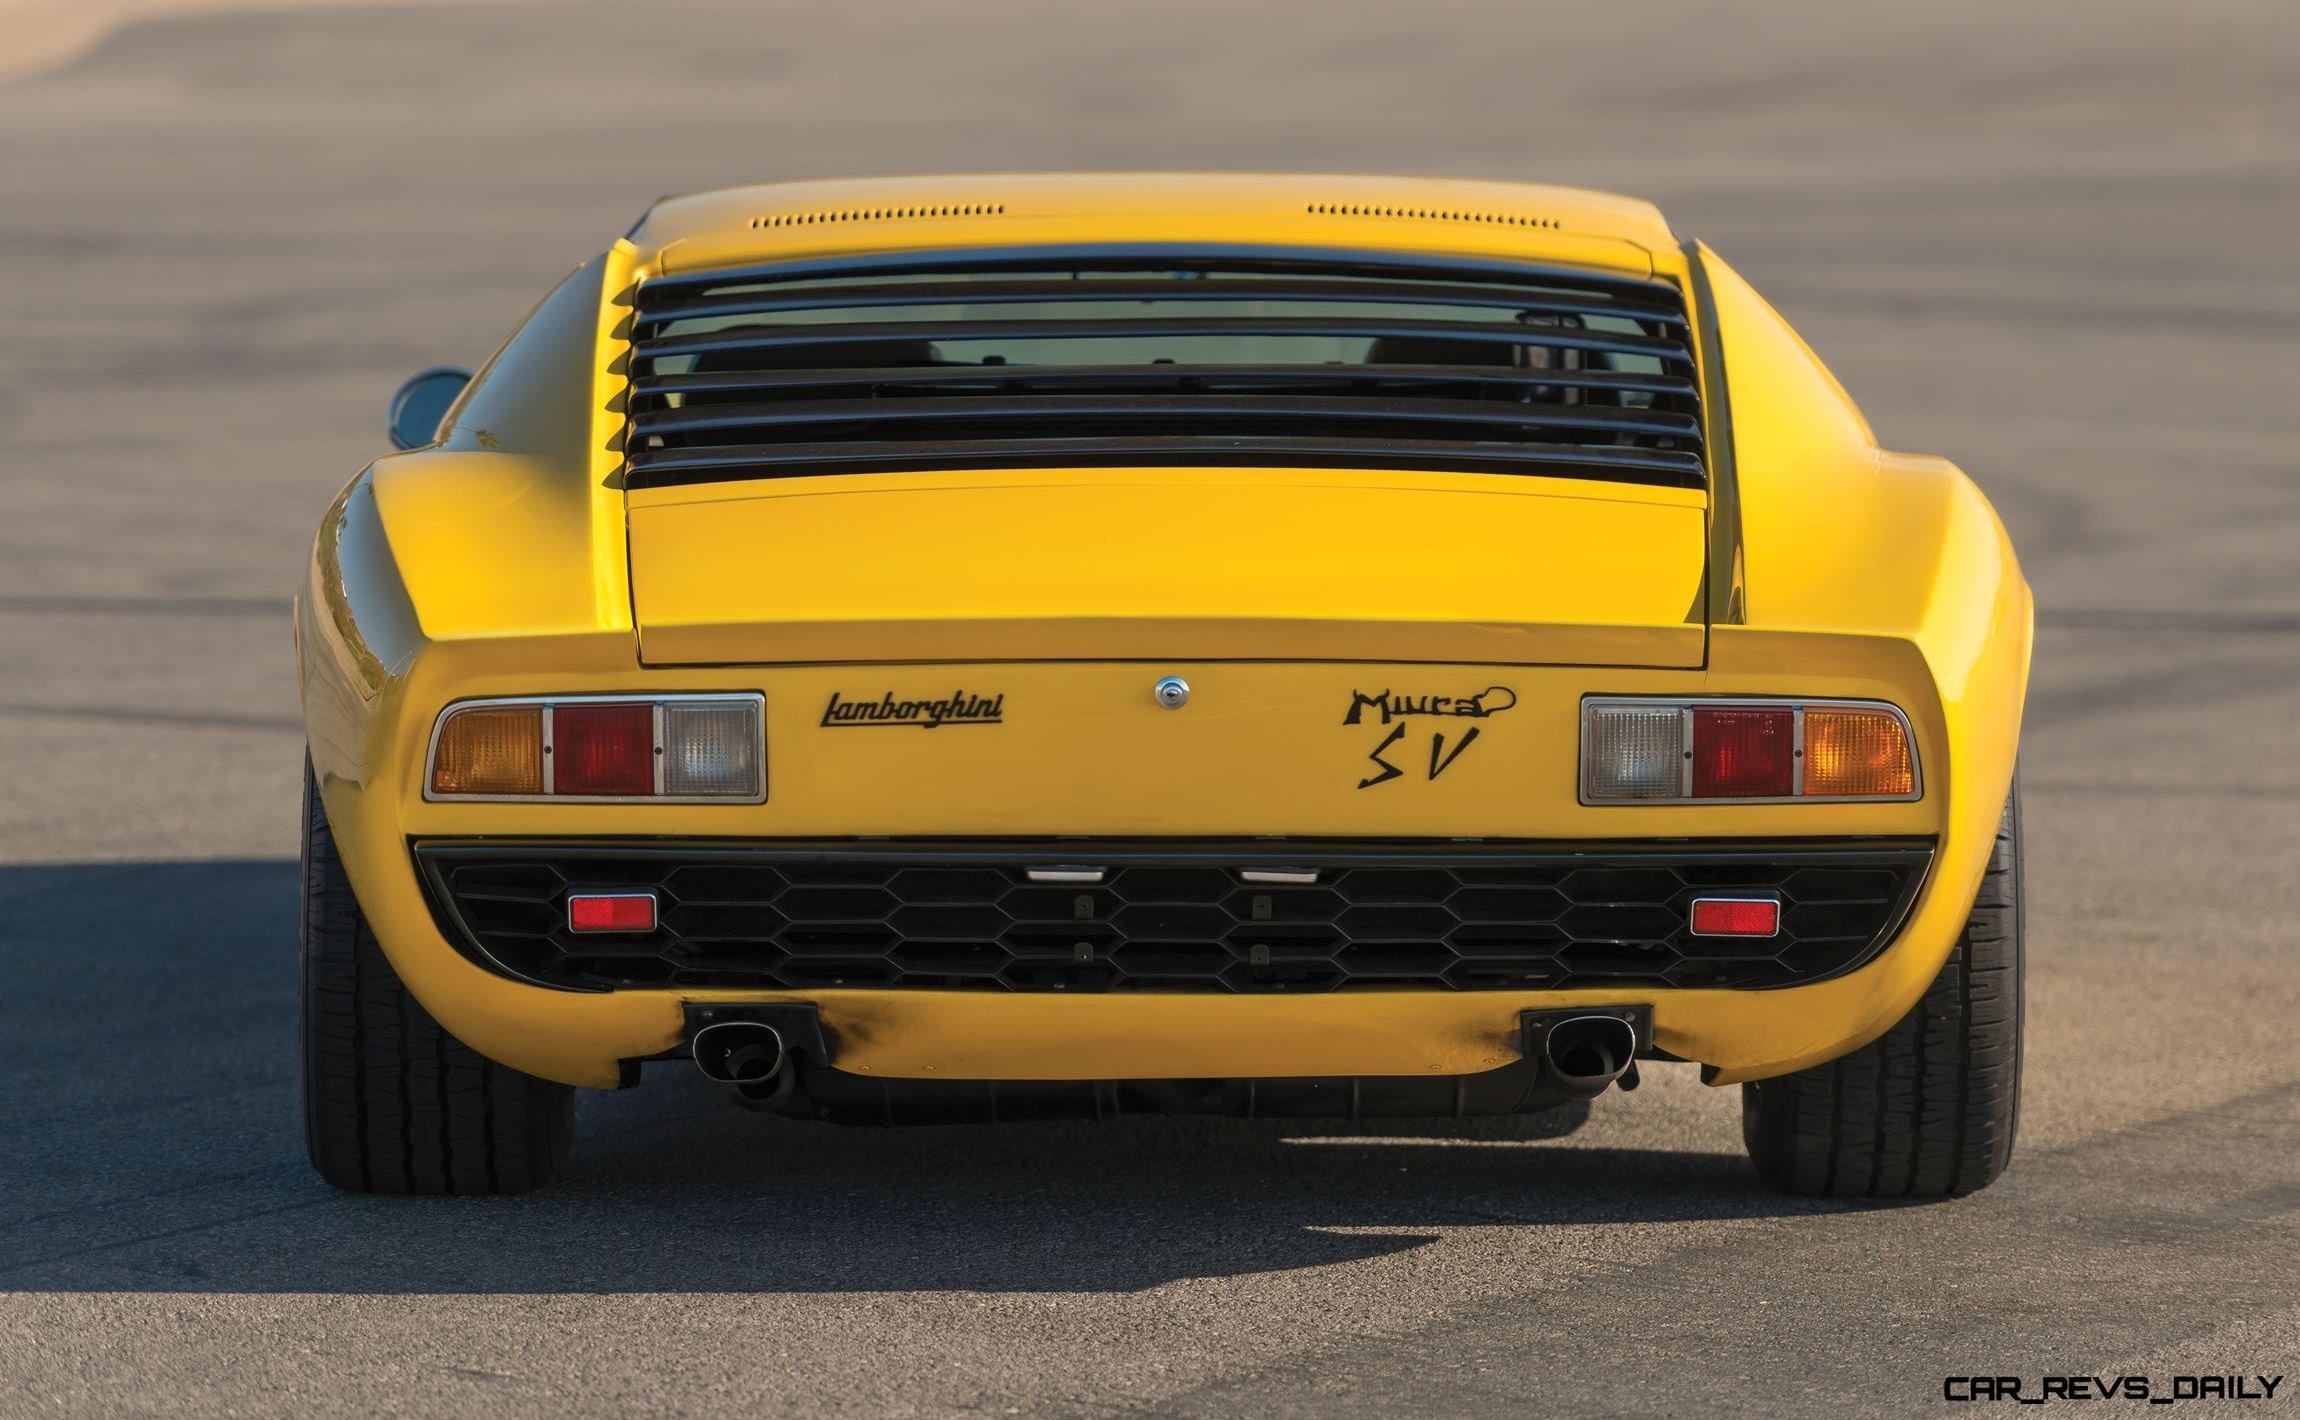 Rm Arizona 2016 1971 Lamborghini Miura P400 Sv